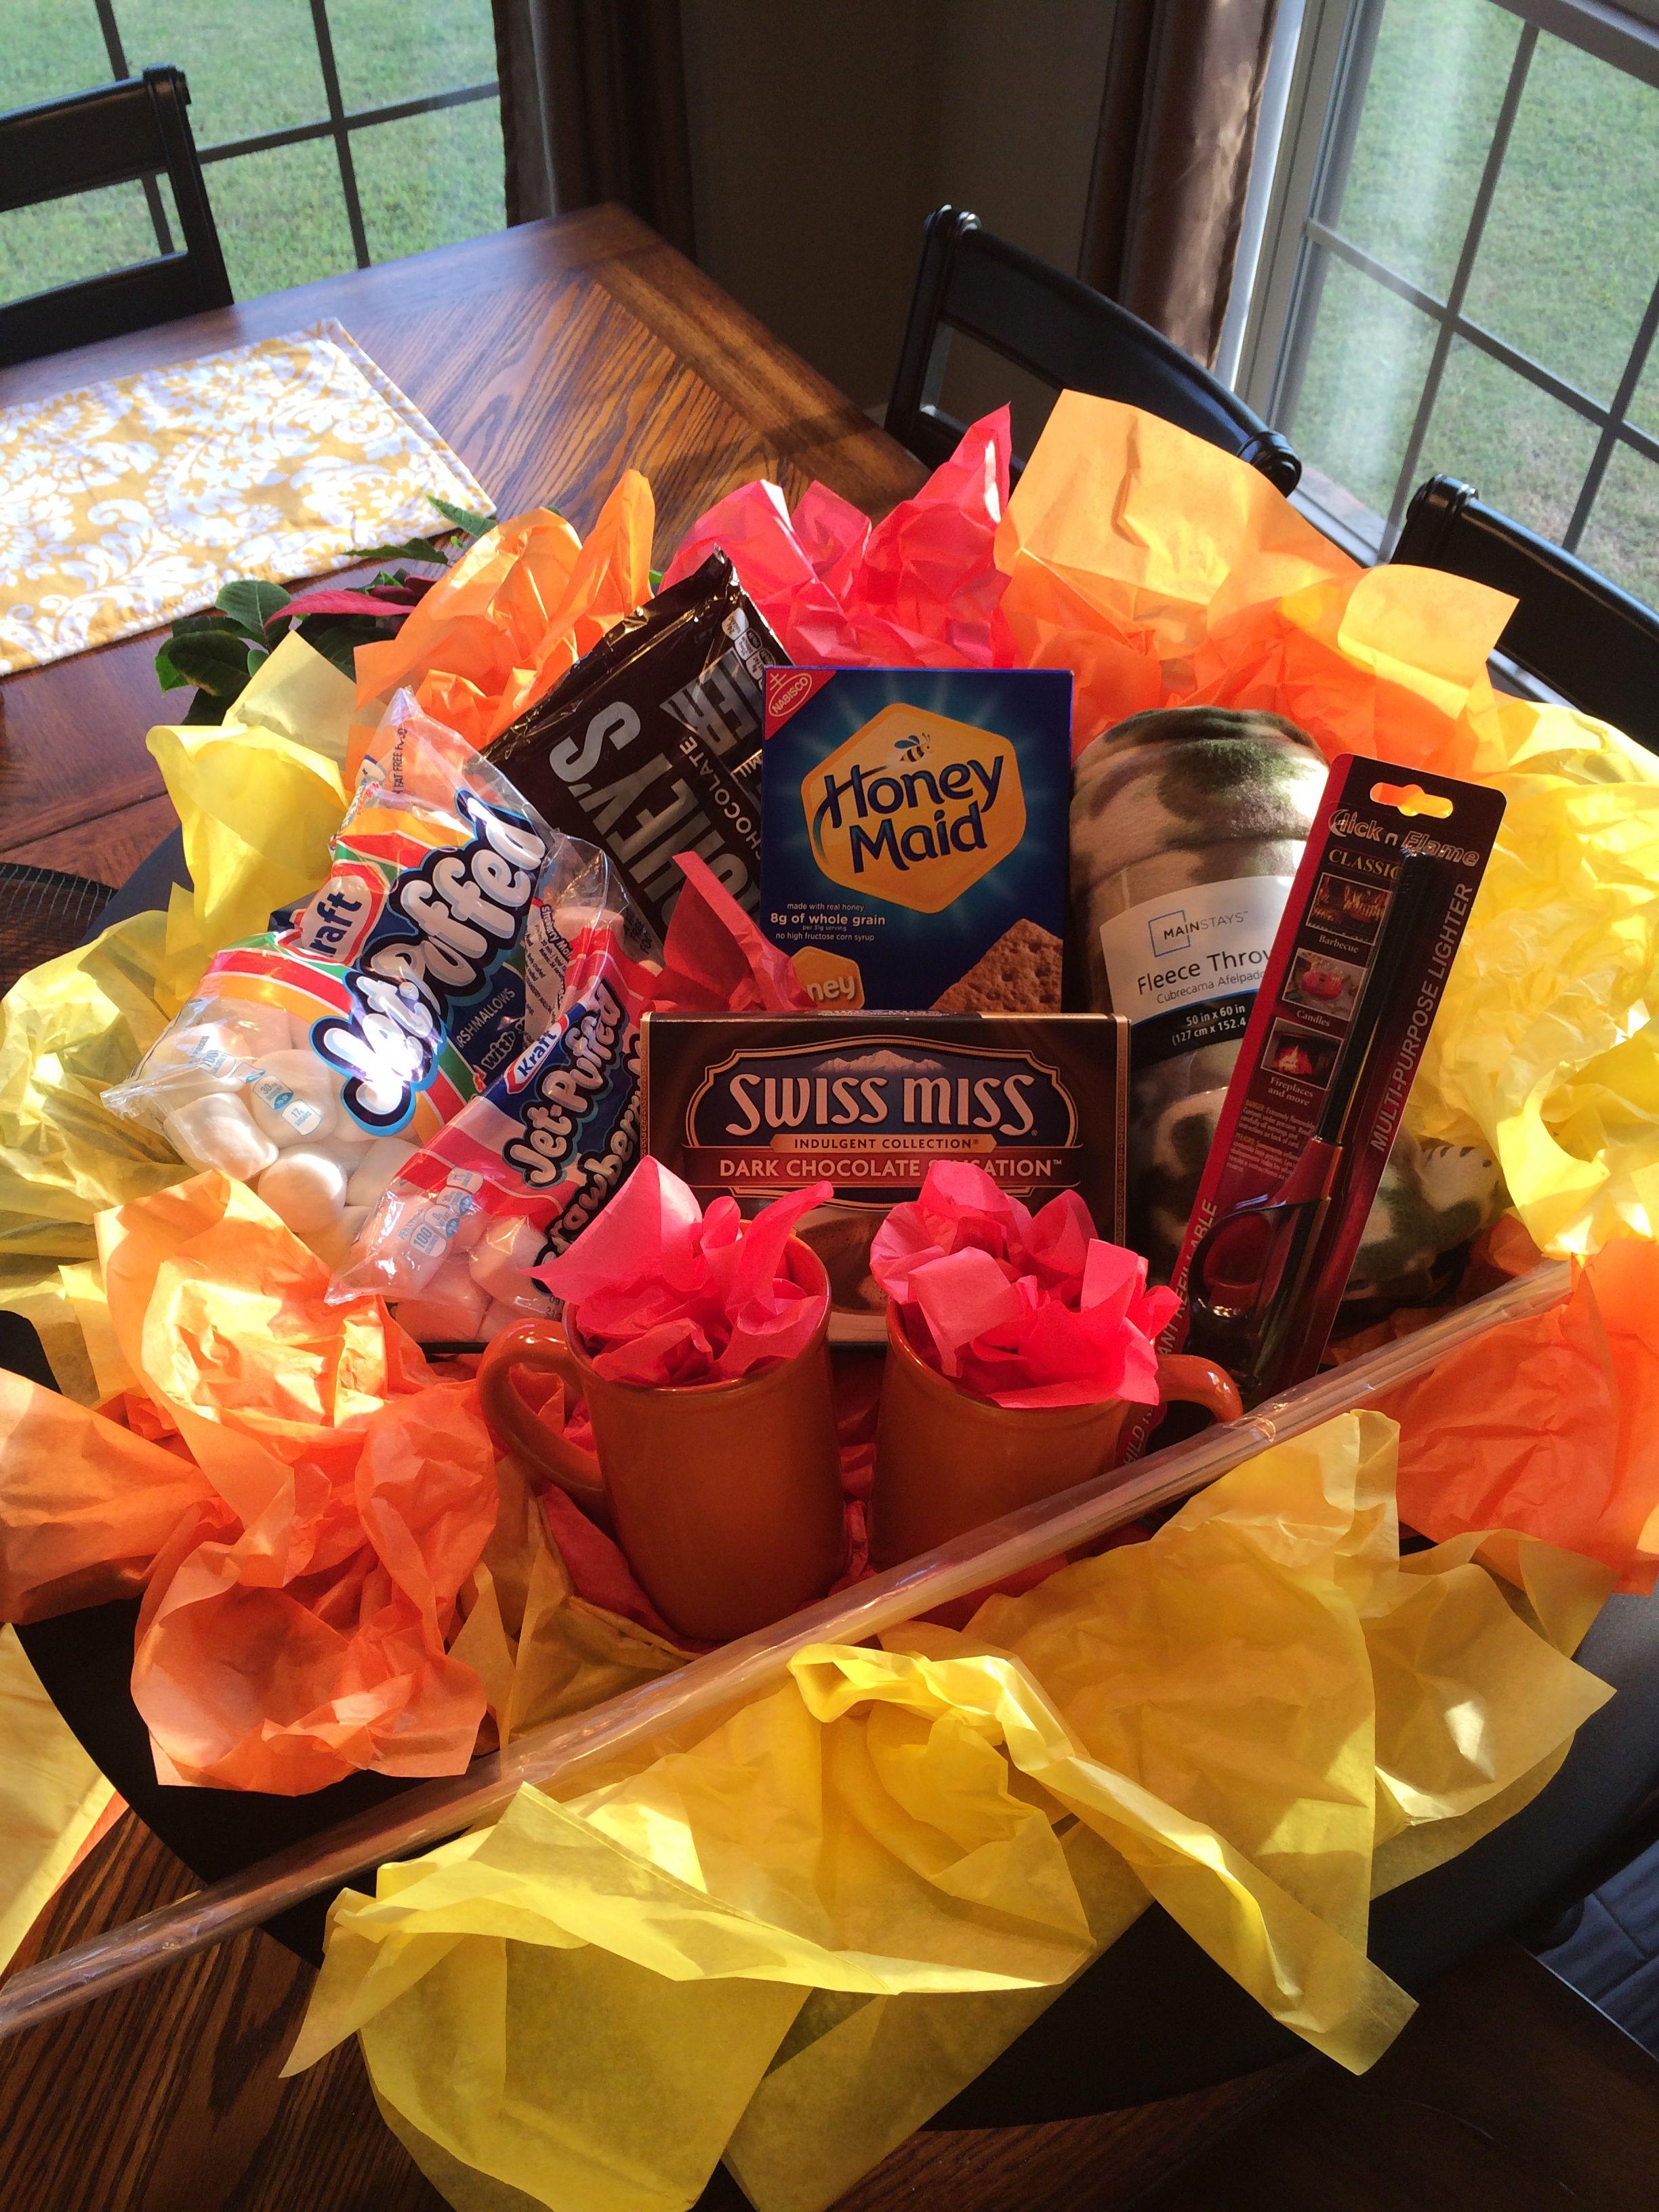 Fire pit backyard bonfire gift basket. Good for a silent ...